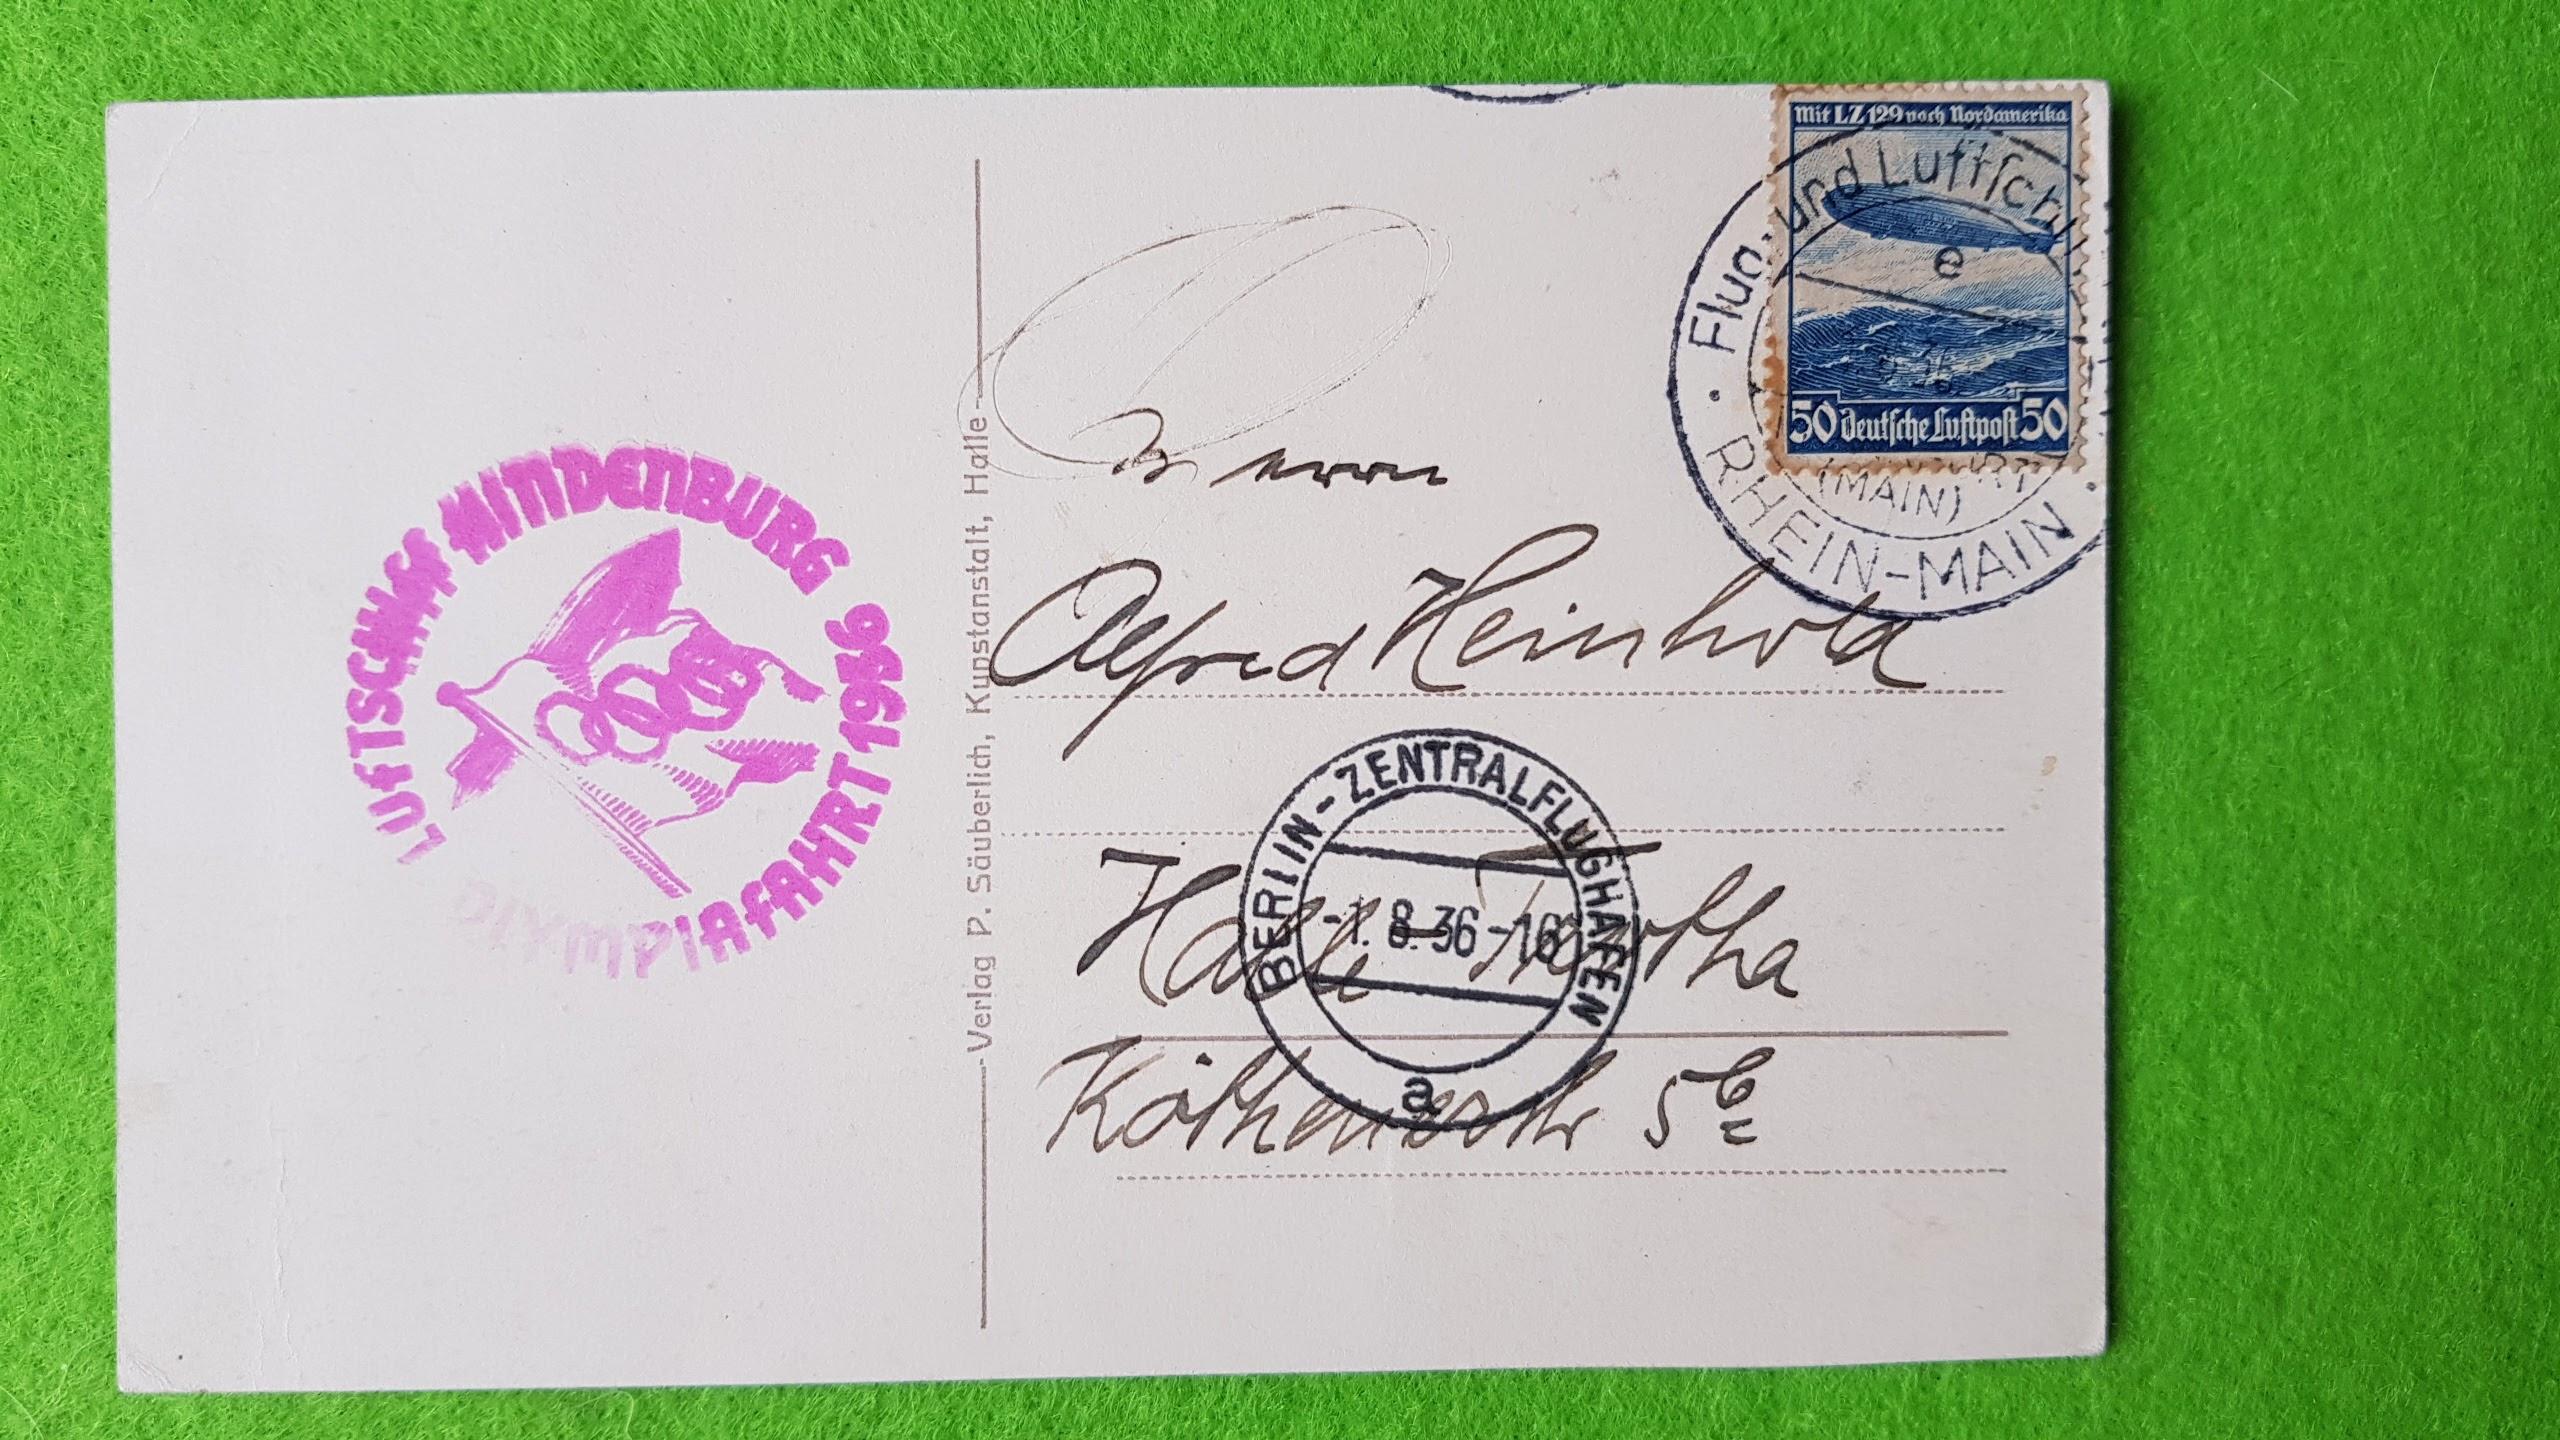 Postkarte vom Olympiaflug des LZ 129 am 1.8.1936